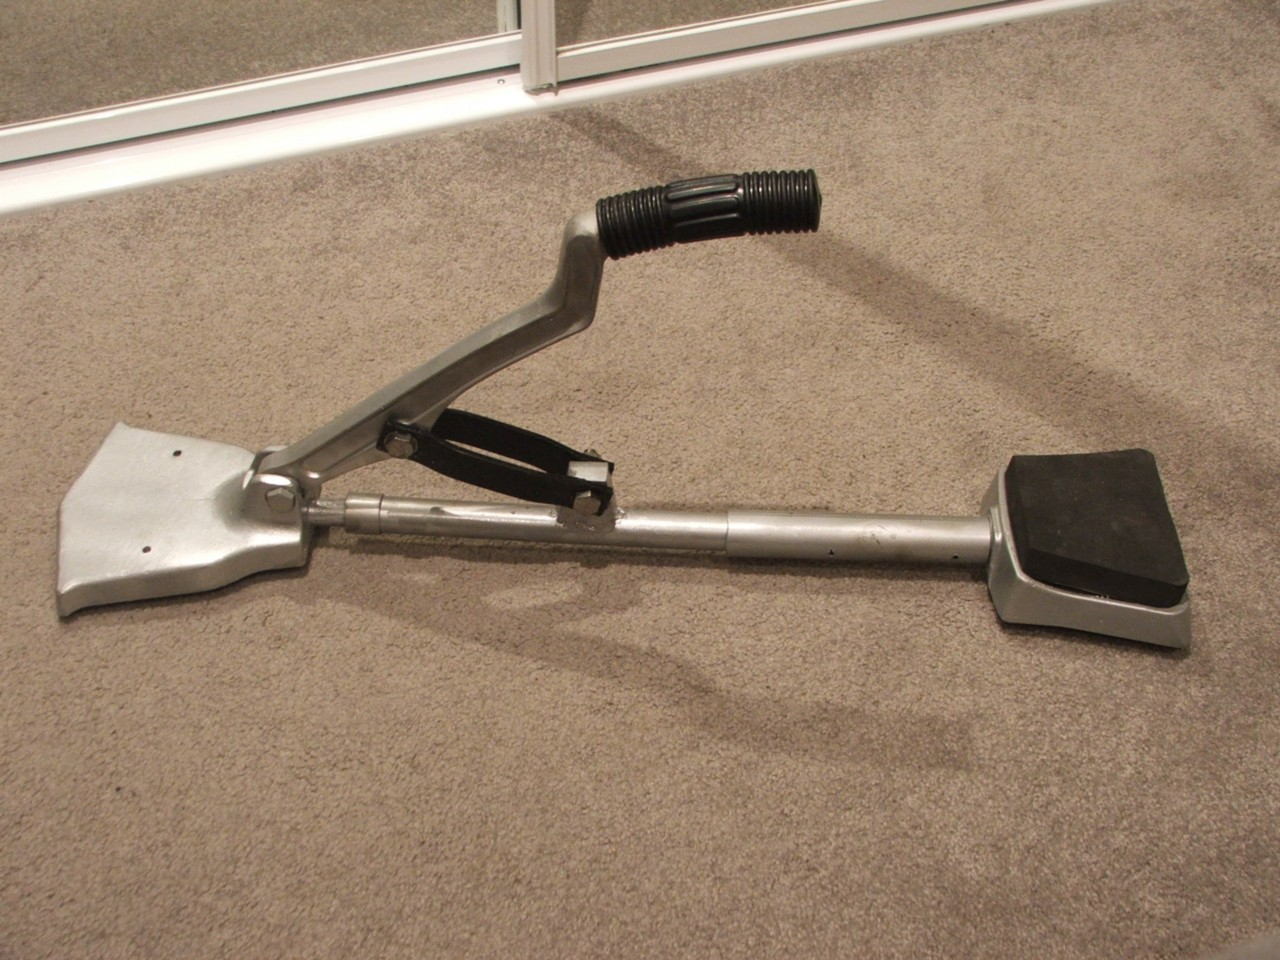 Carpetlayers Power Stretcher Knee Kicker Carpet Tools | eBay